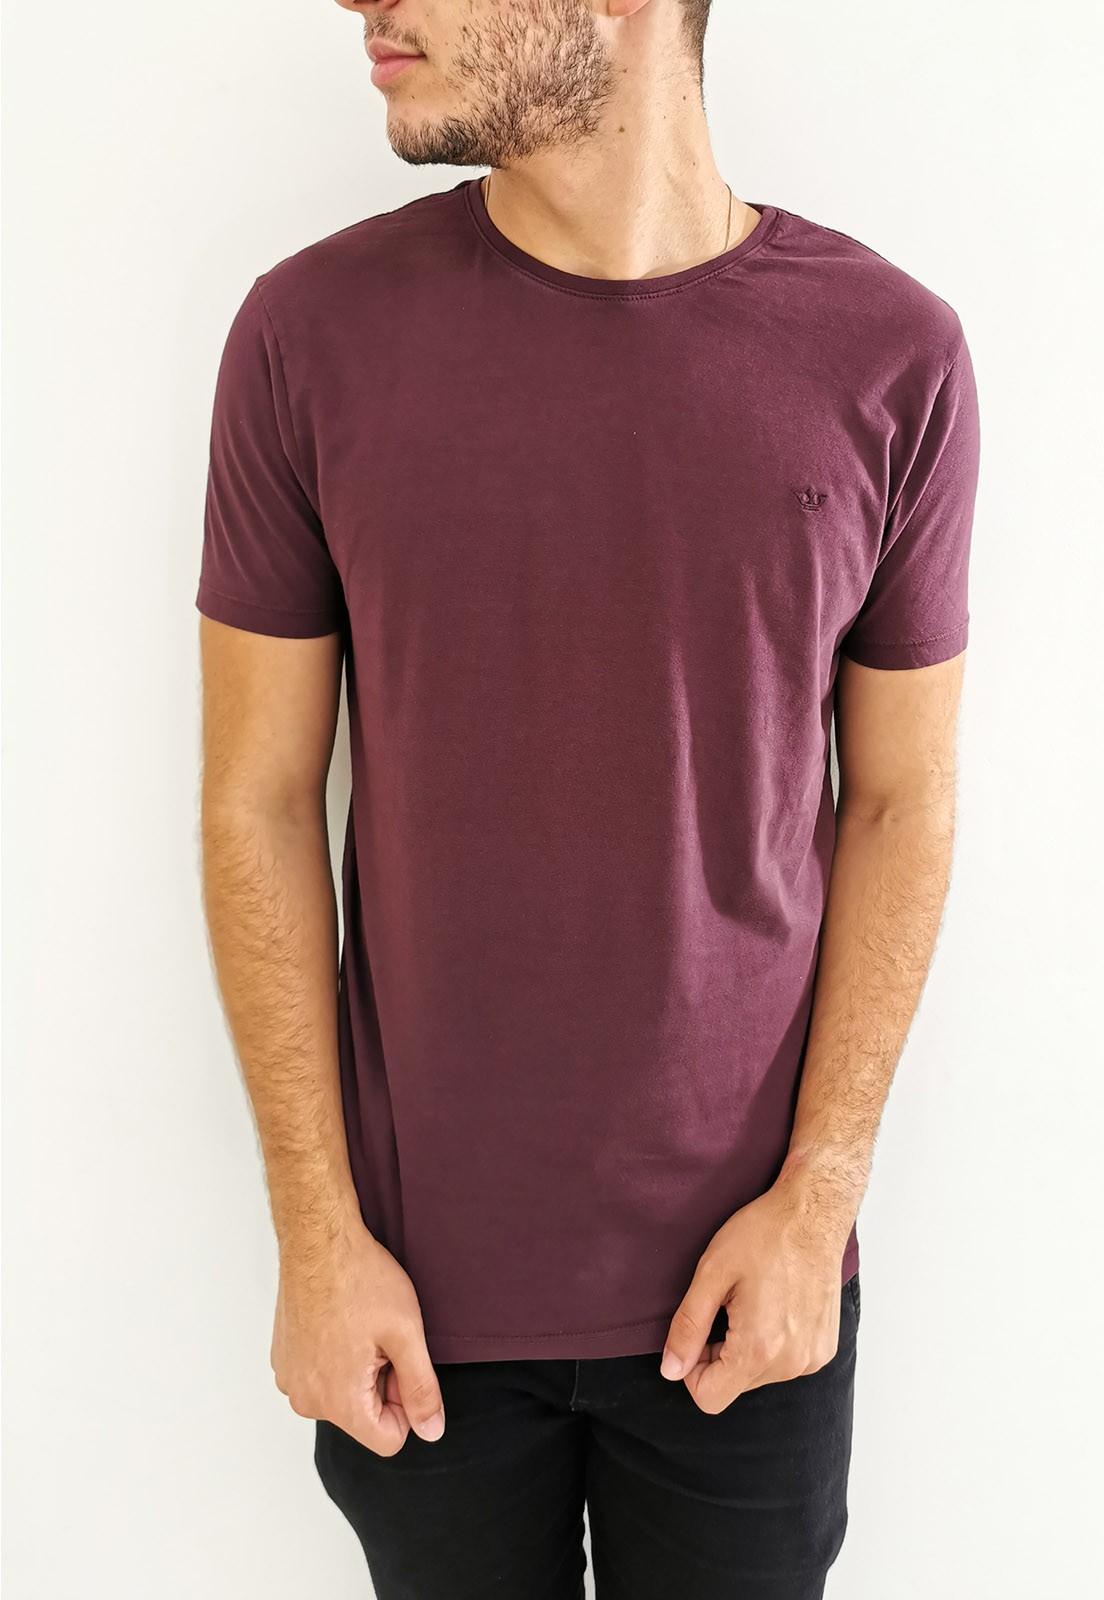 Camiseta Docthos Bordô